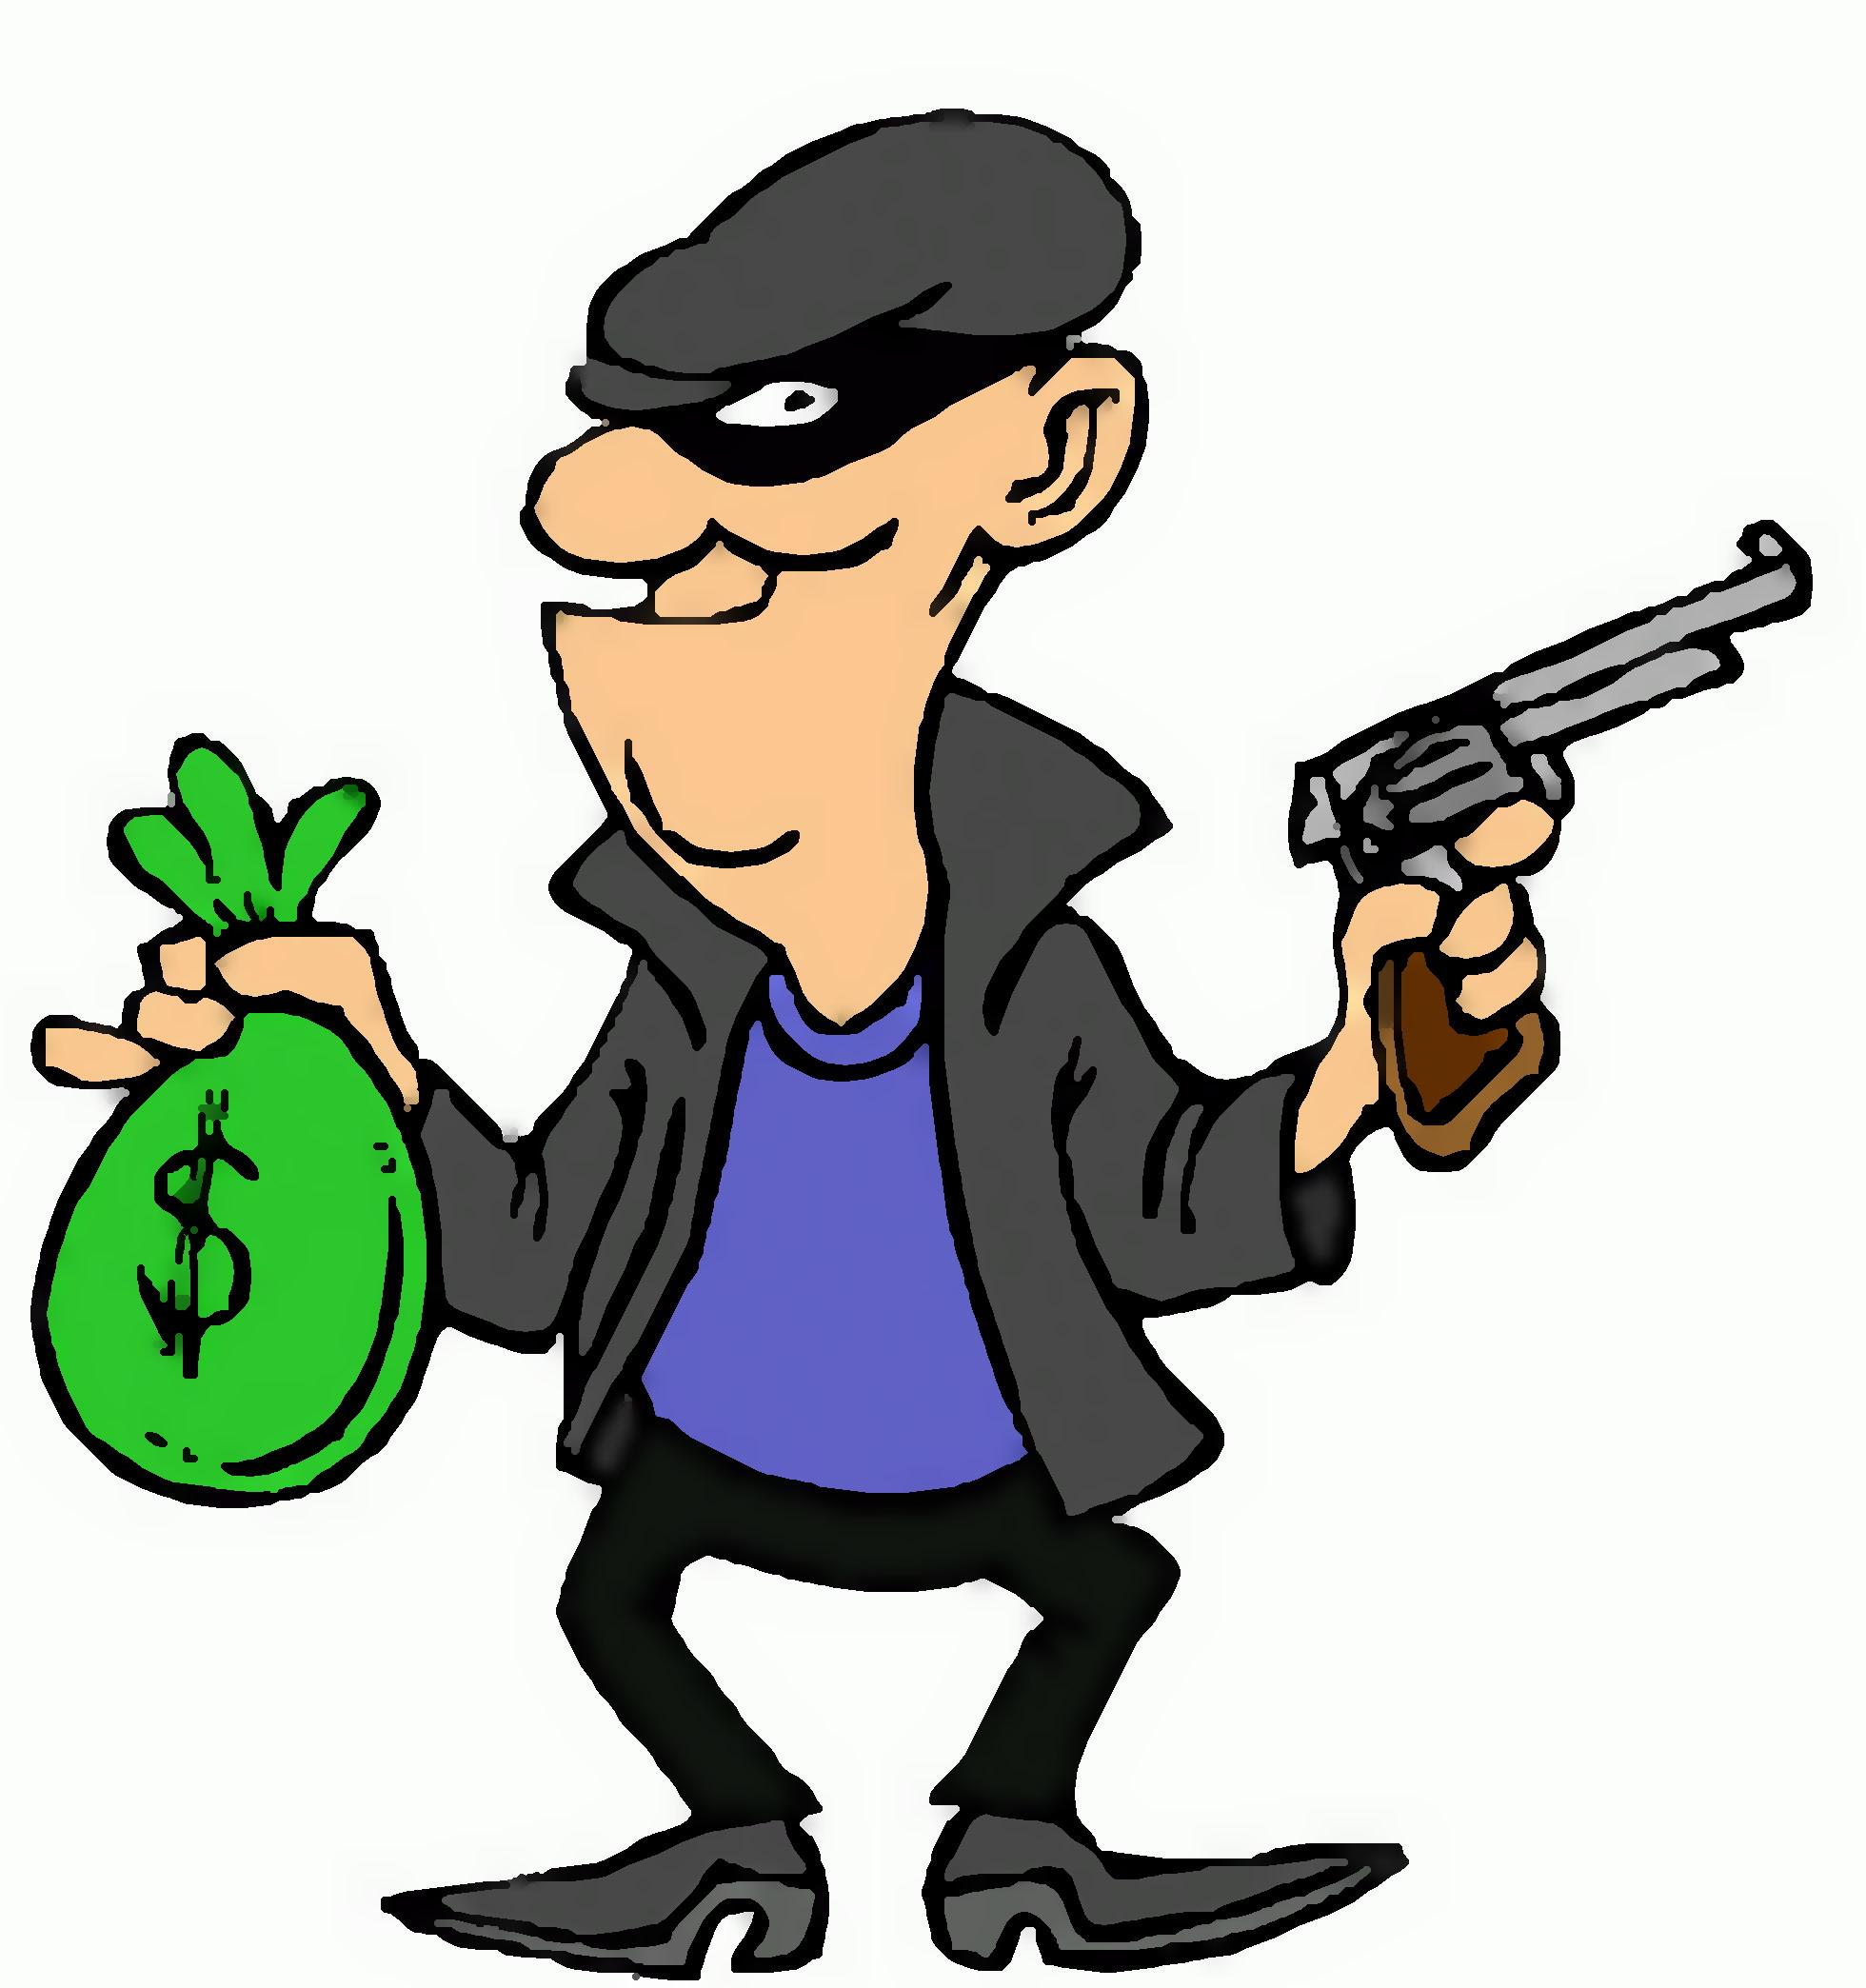 Burglar clipart rob. Free download best on